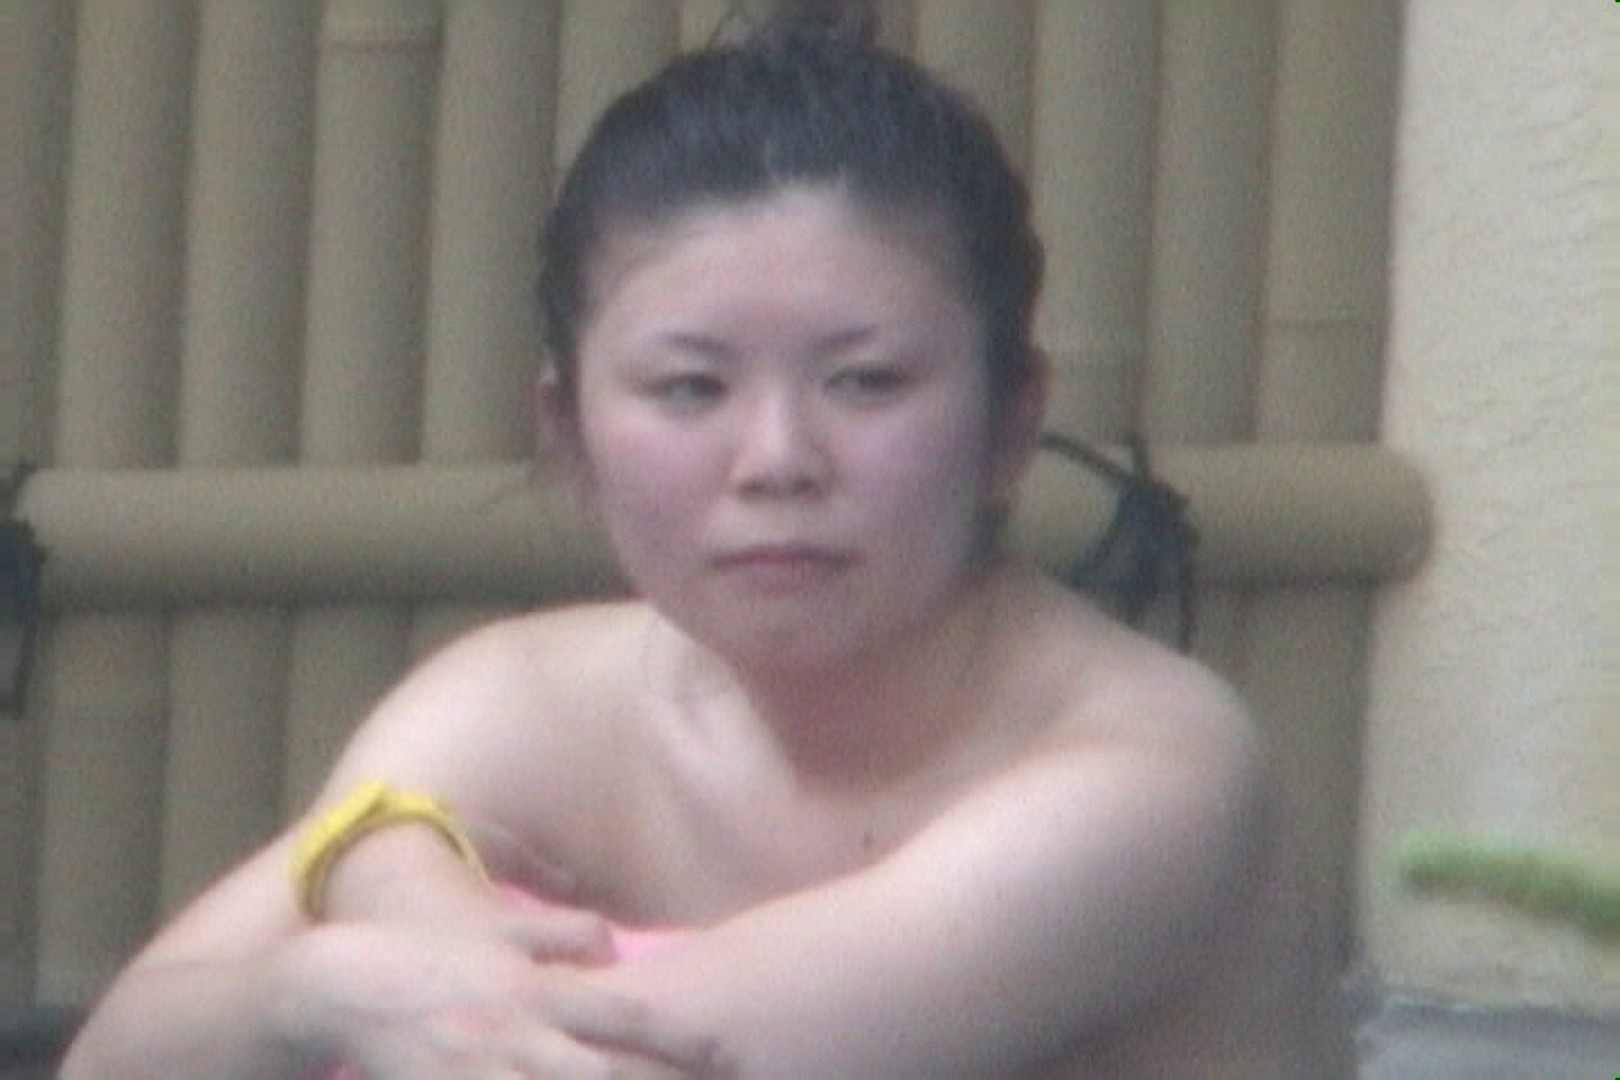 Aquaな露天風呂Vol.47【VIP限定】 露天風呂突入 オマンコ無修正動画無料 94pic 92